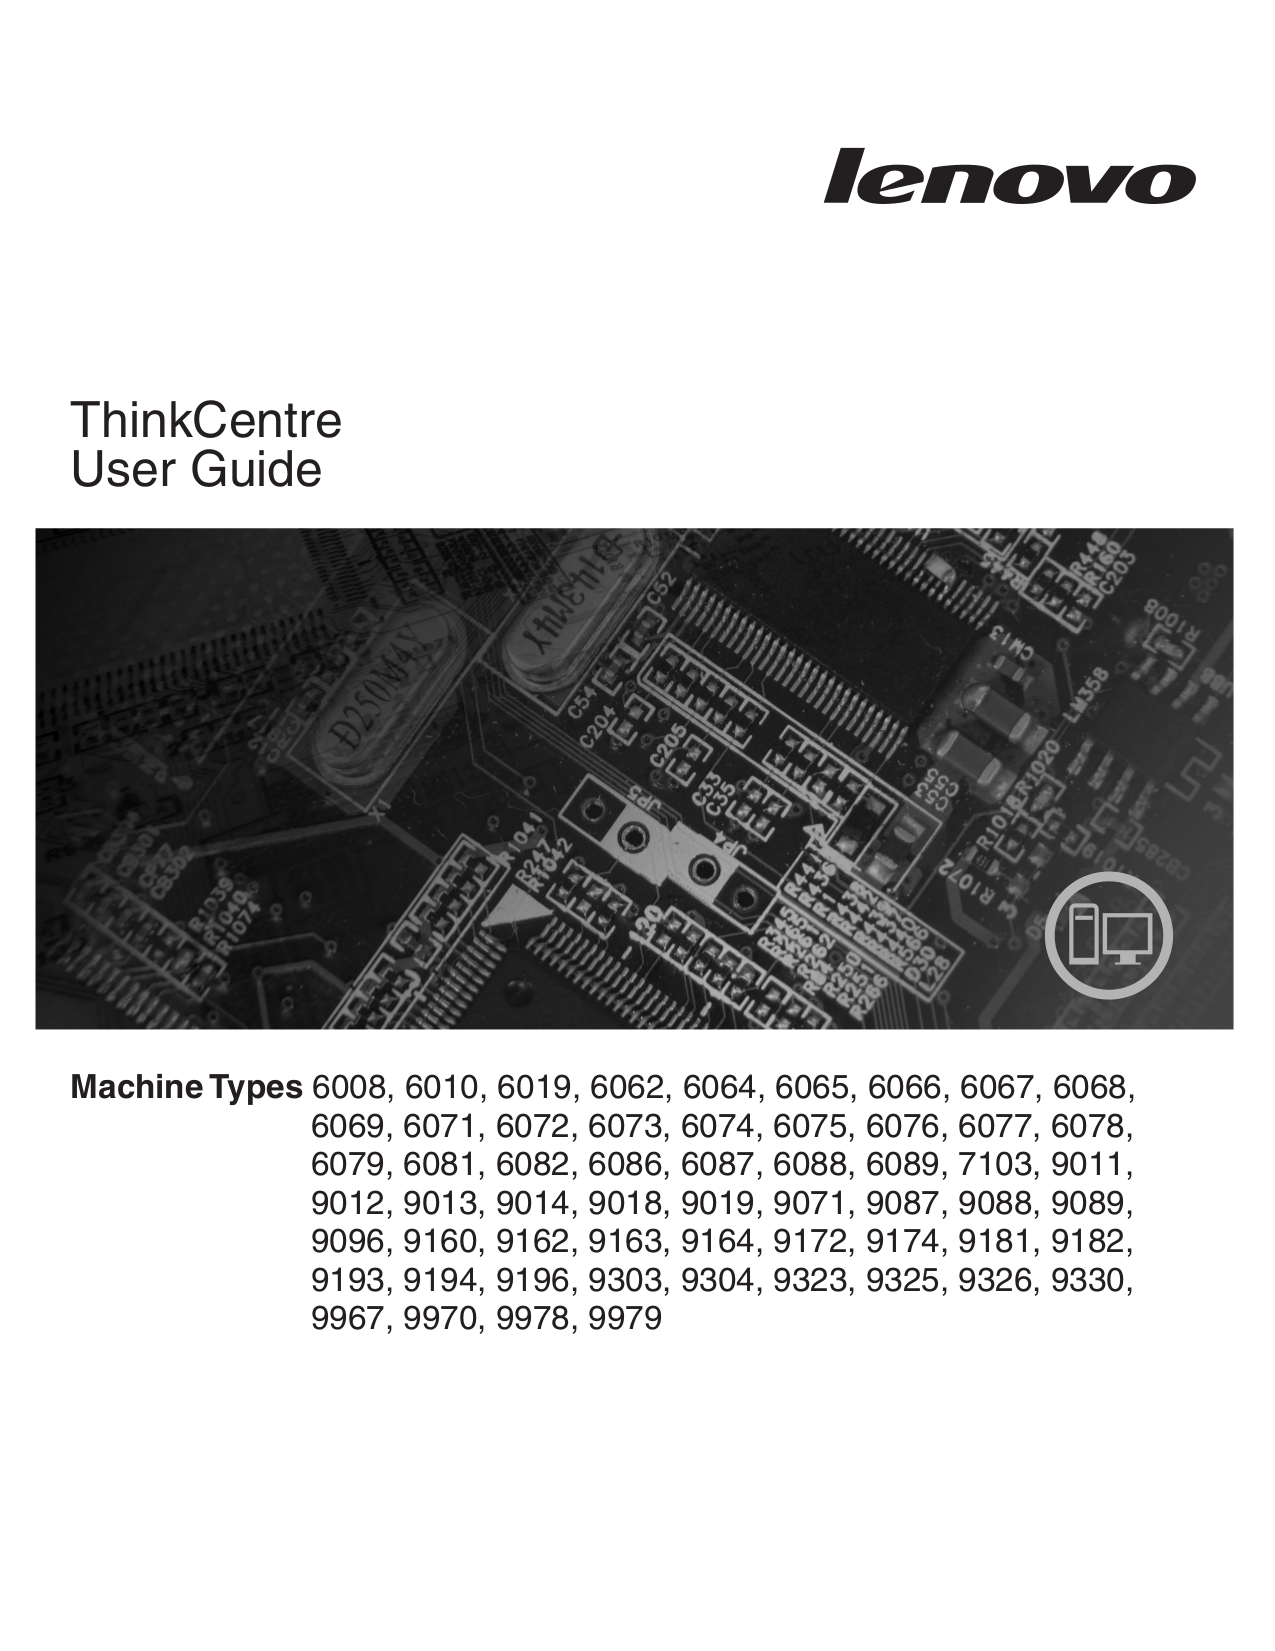 pdf for Lenovo Desktop ThinkCentre M57p 9196 manual